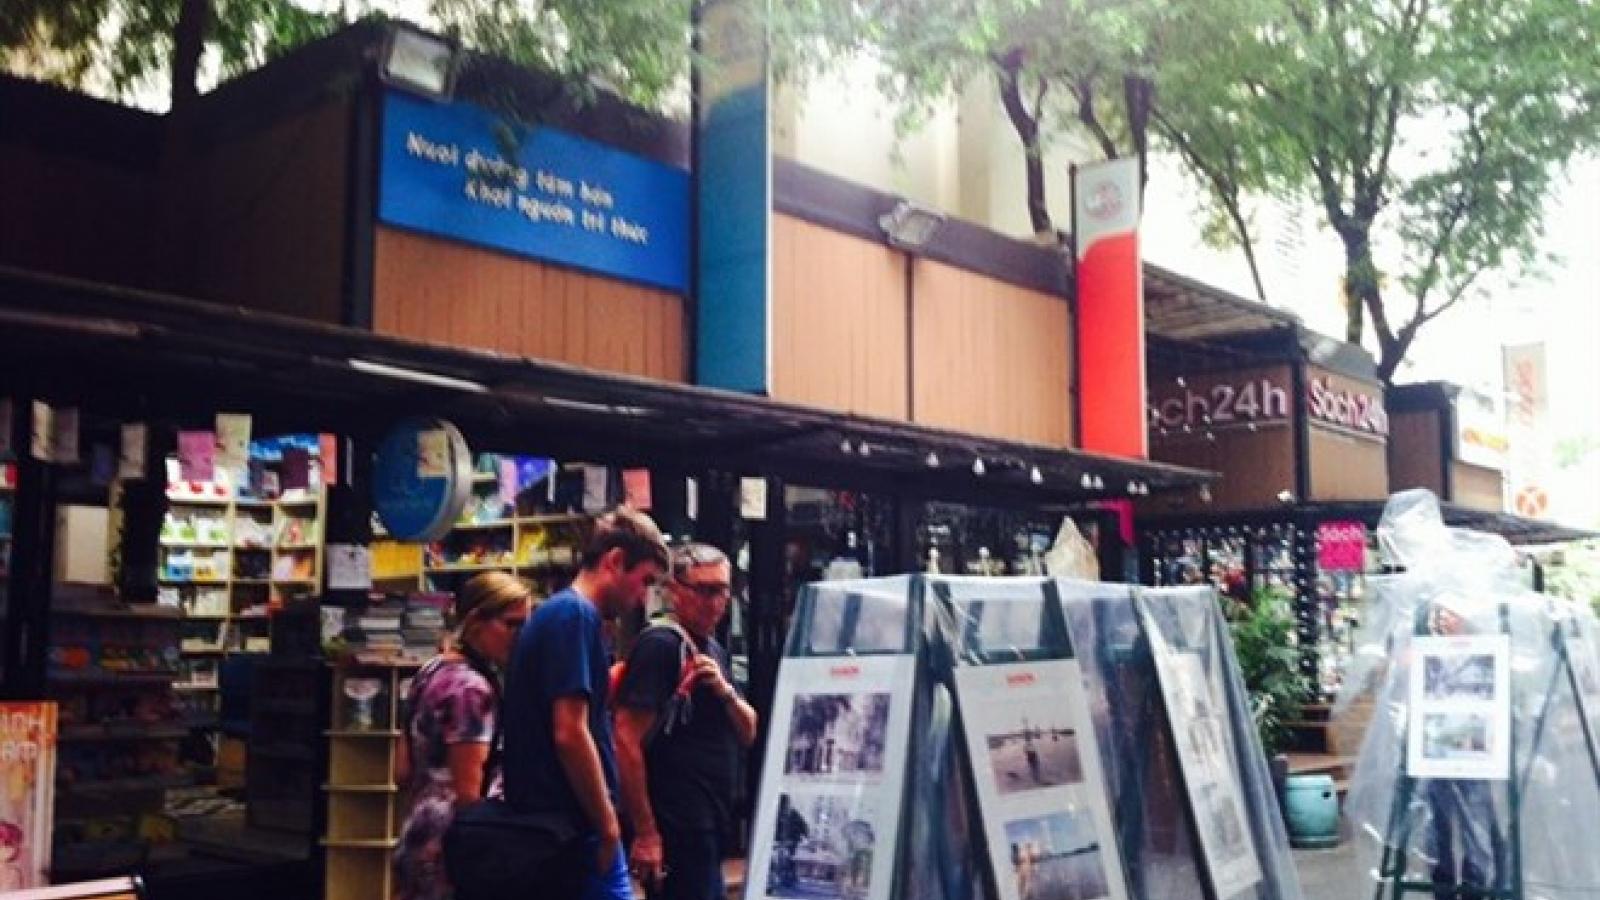 Photo exhibition on Saigon history